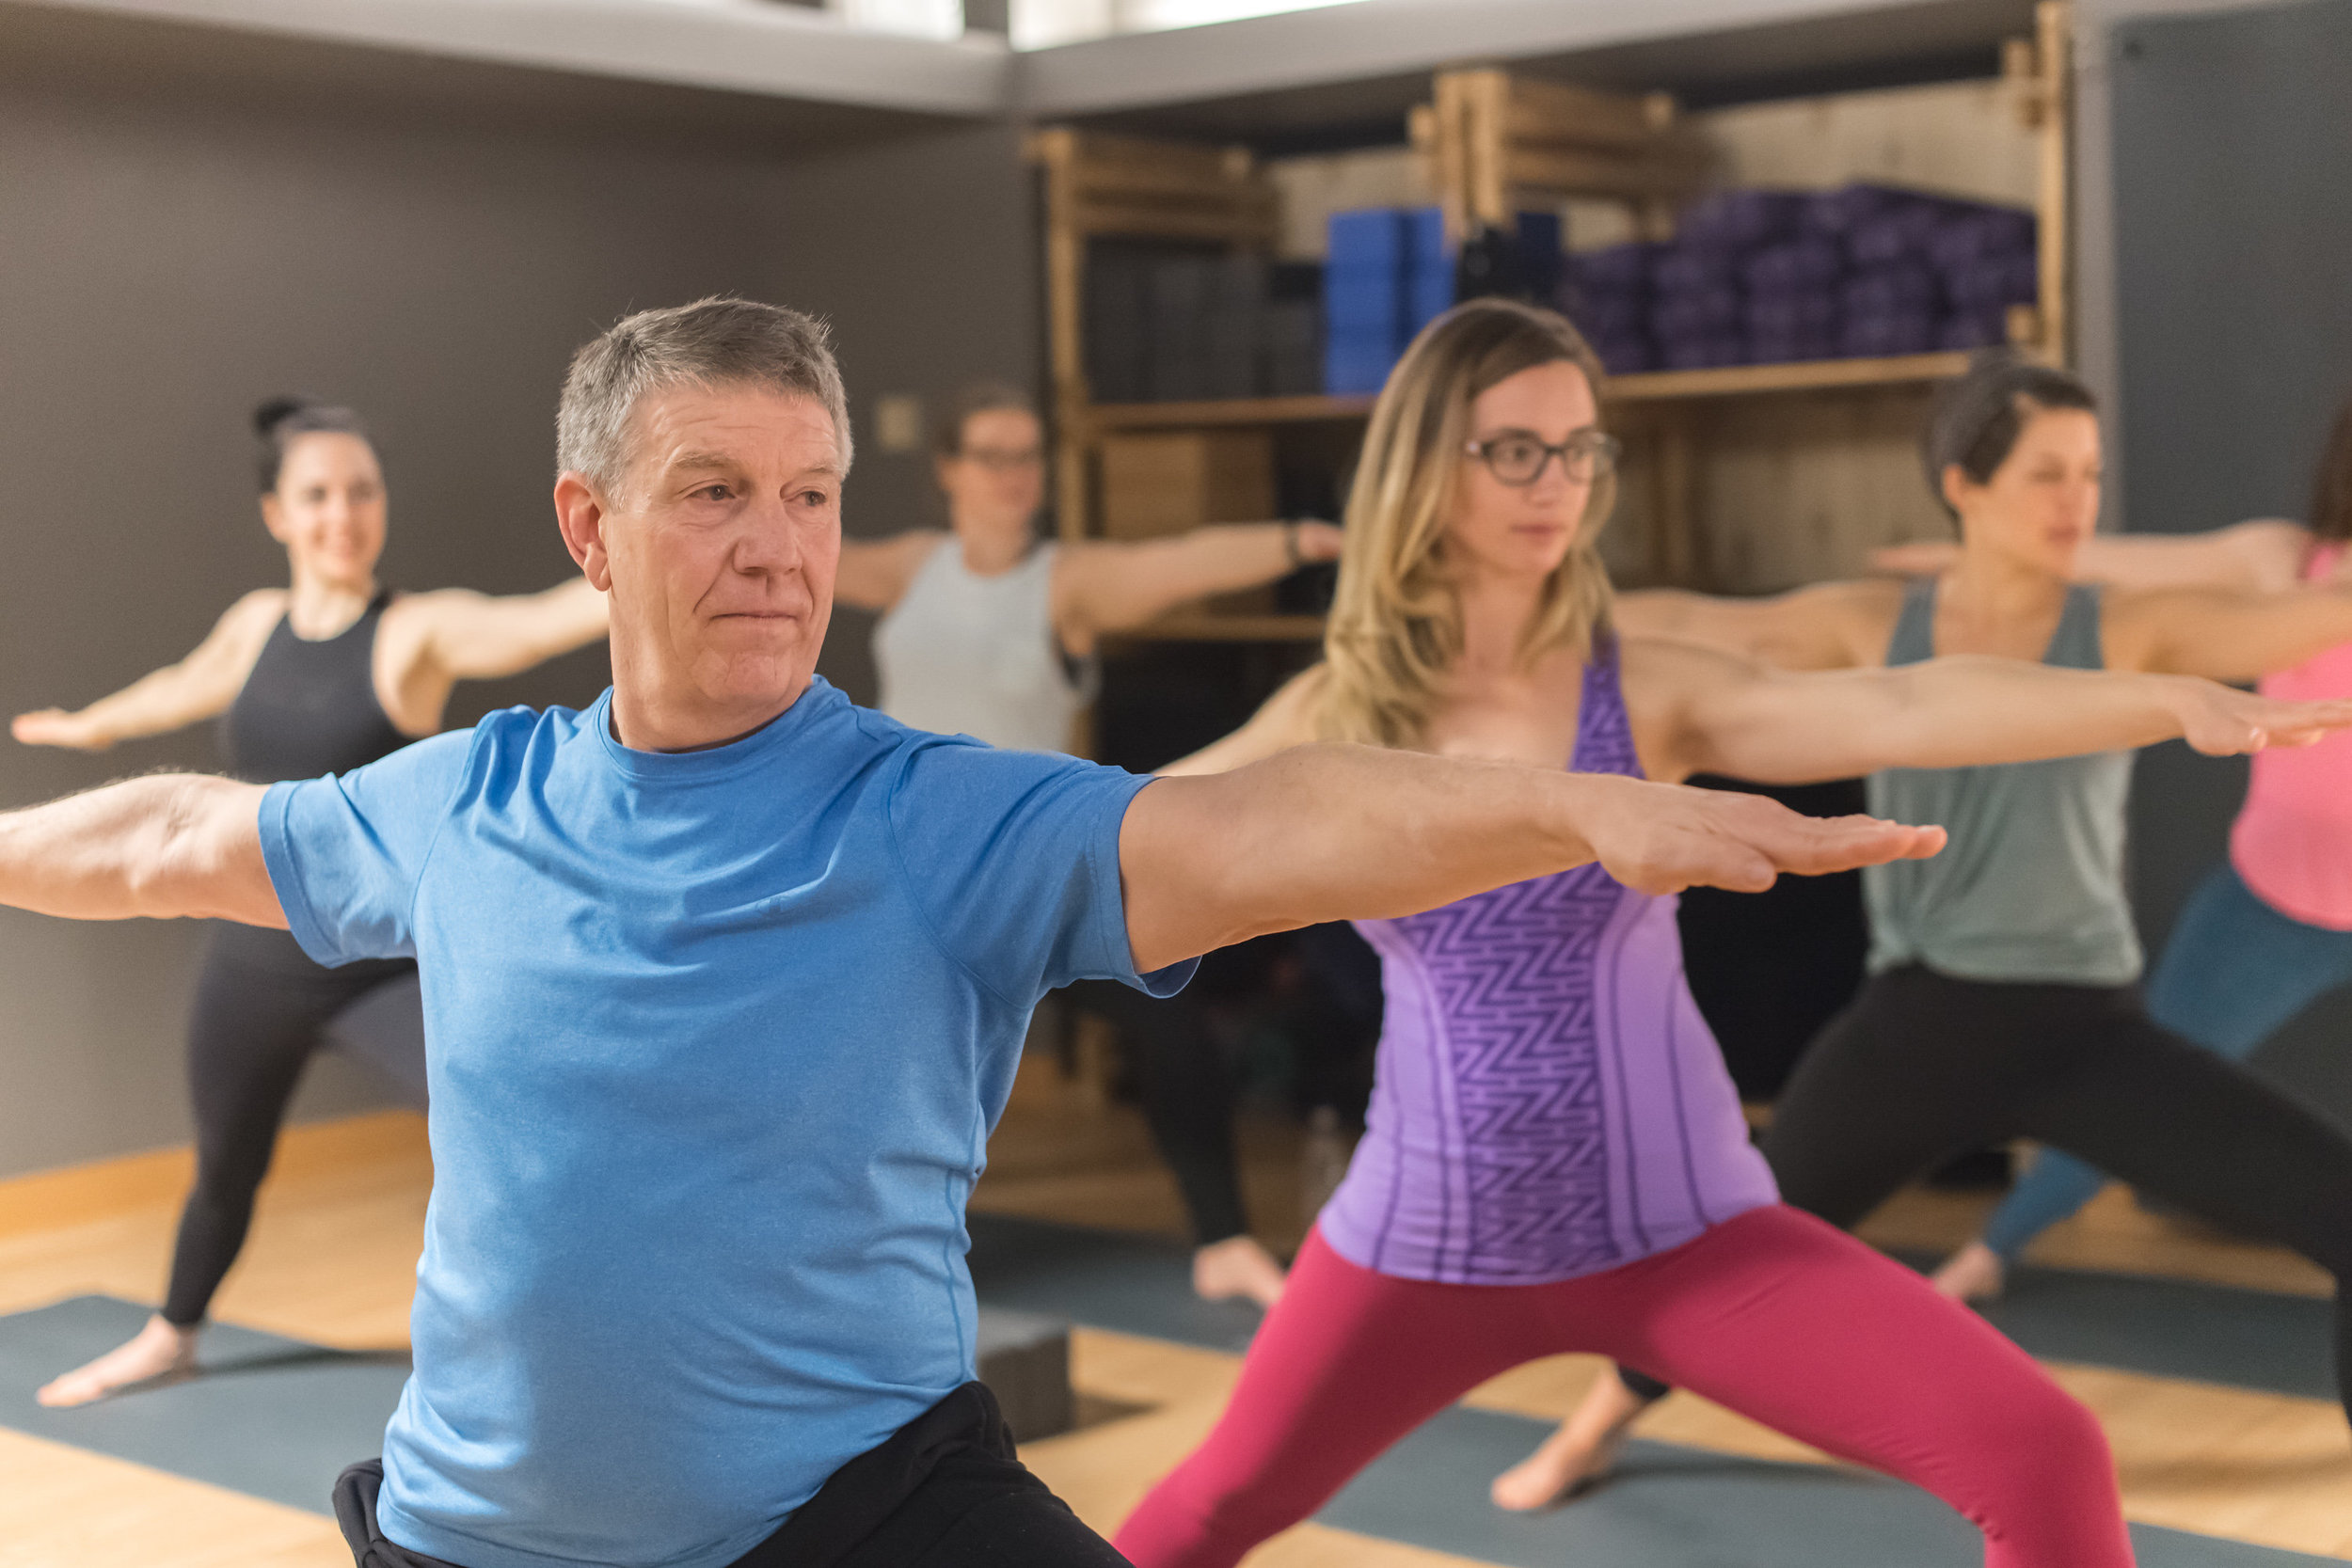 chicago, il - Bottom line yoga